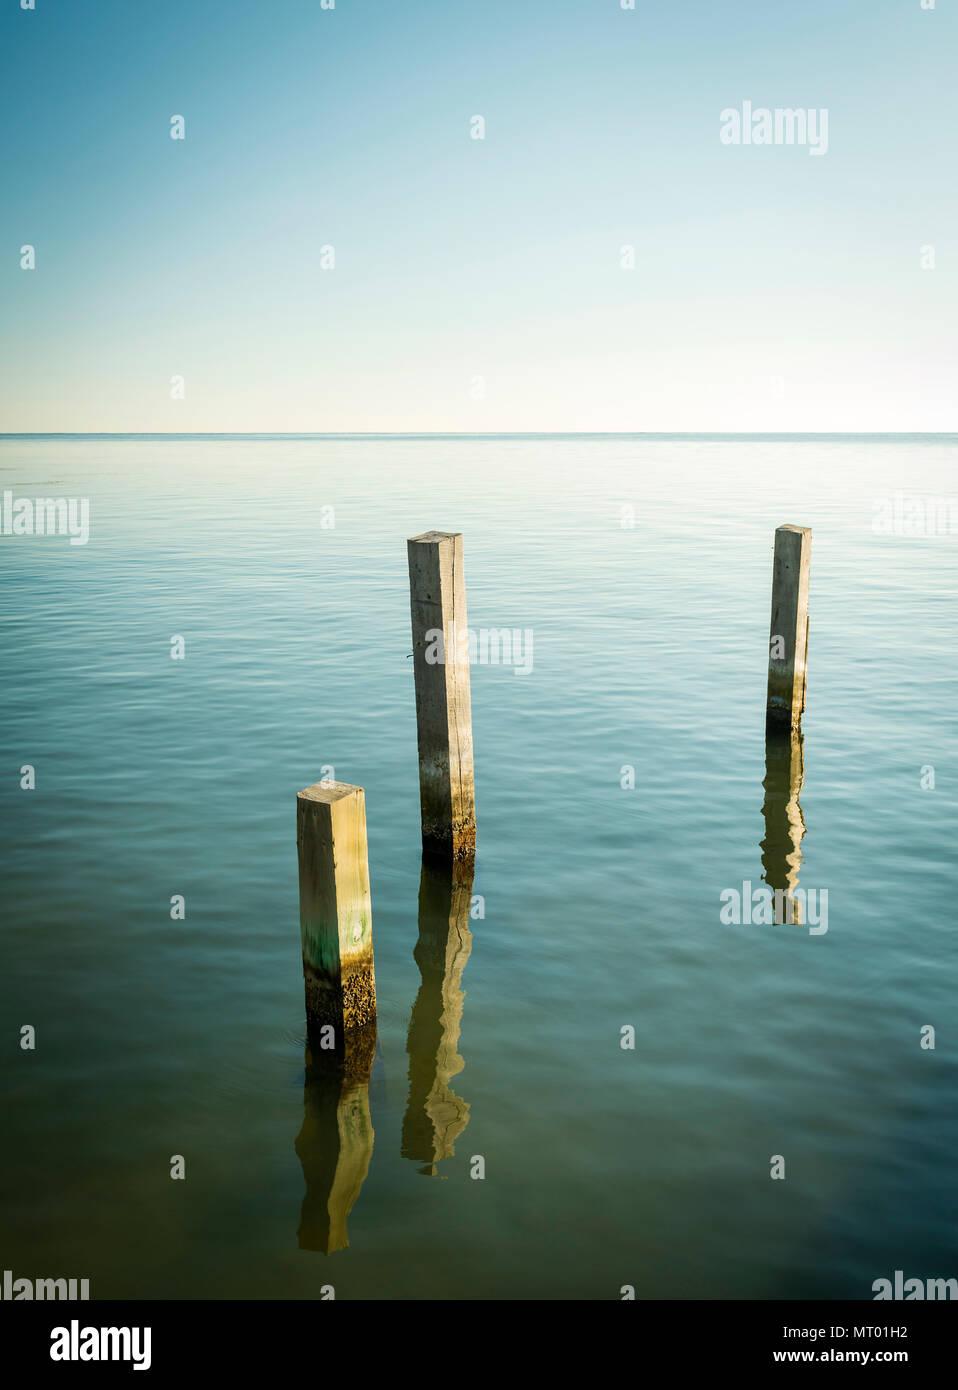 Ocean landscape with minimalism design of wooden pylons - Stock Image